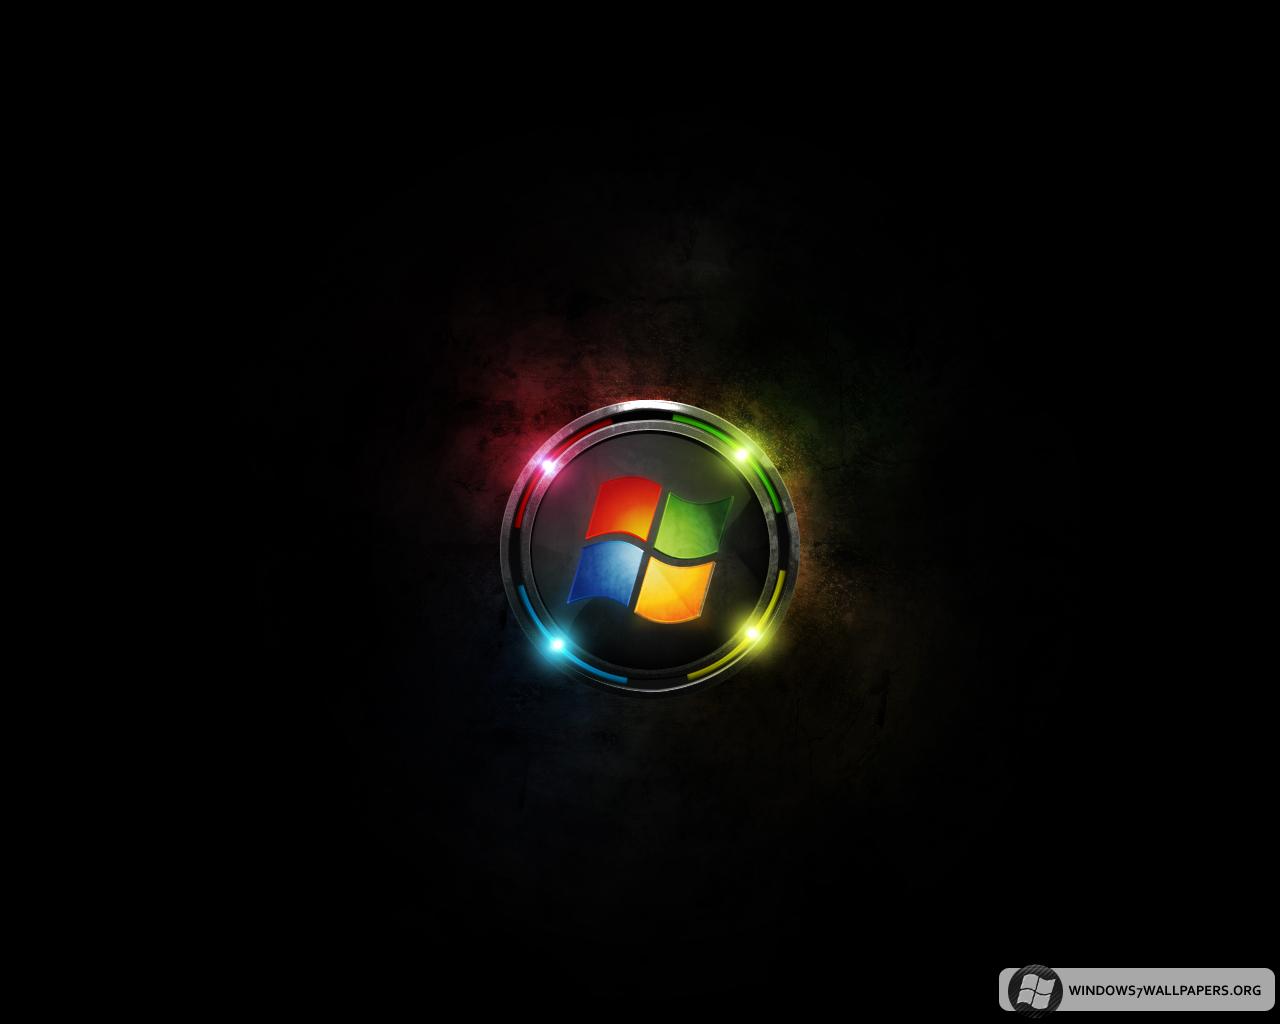 Microsoft Windows Wallpaper 1280x1024 Microsoft Windows 1280x1024